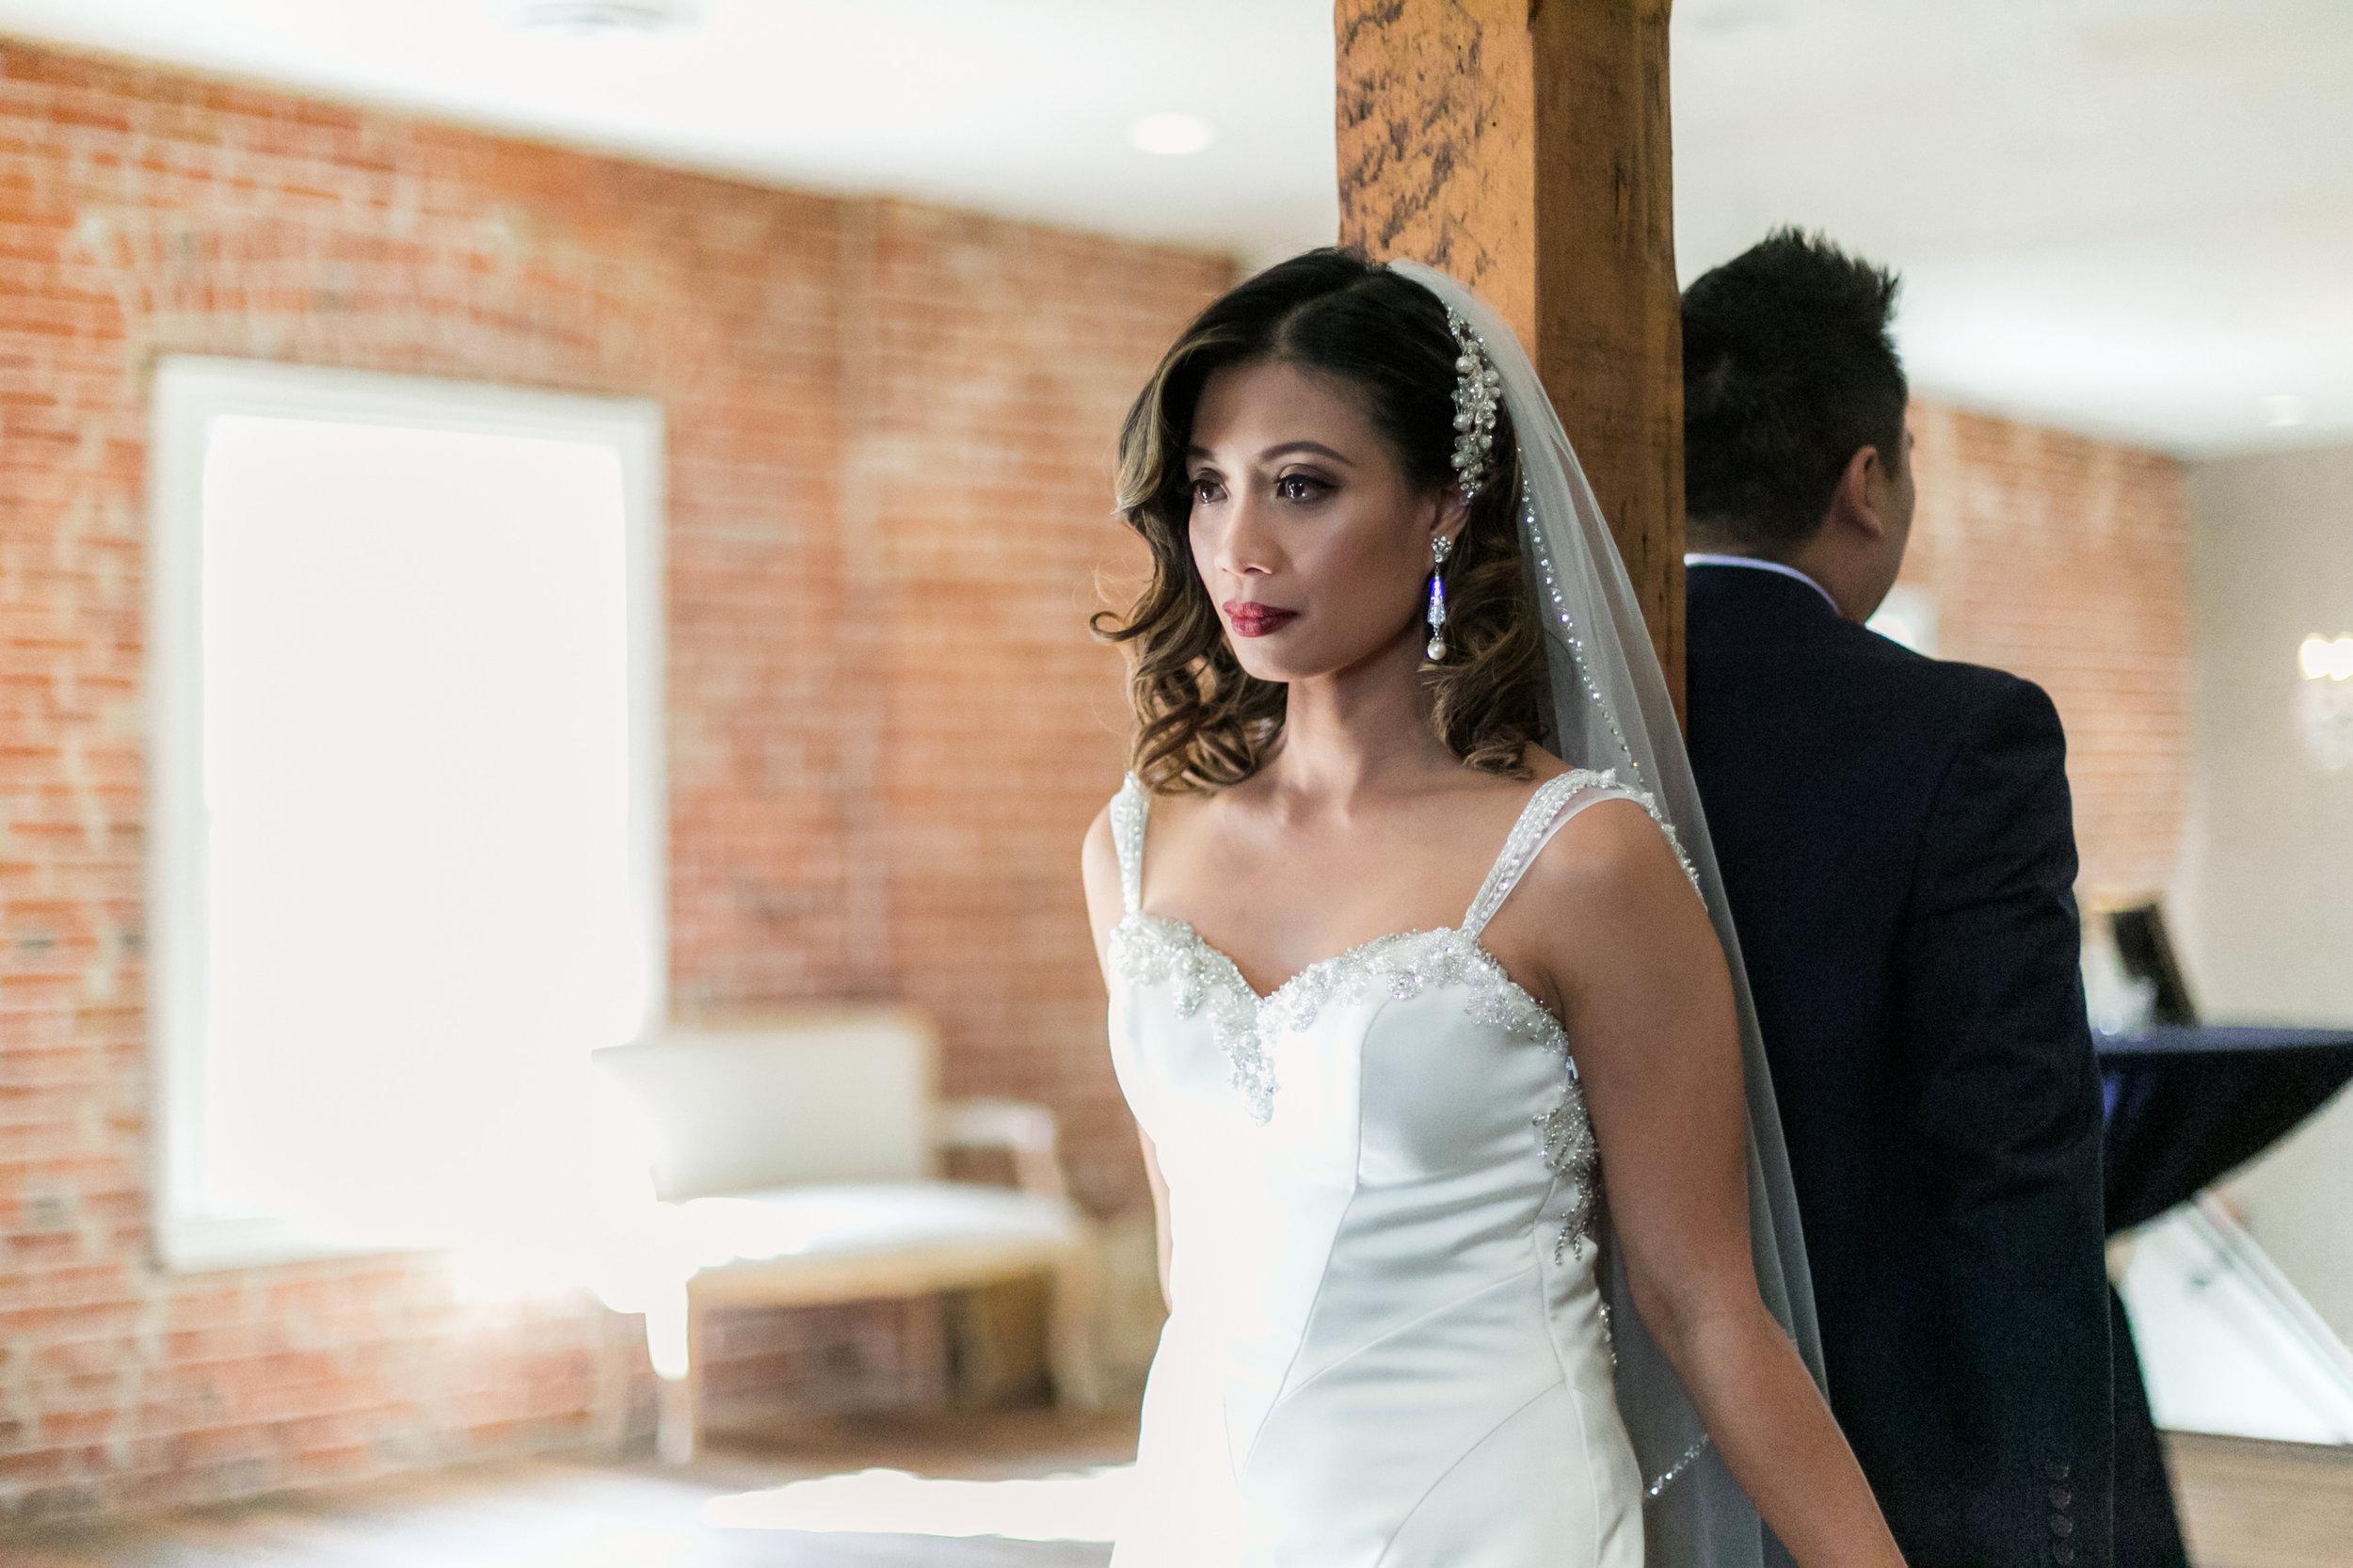 2017.09.24_Doane and Eric Wedding_Bride and Groom-37.jpeg